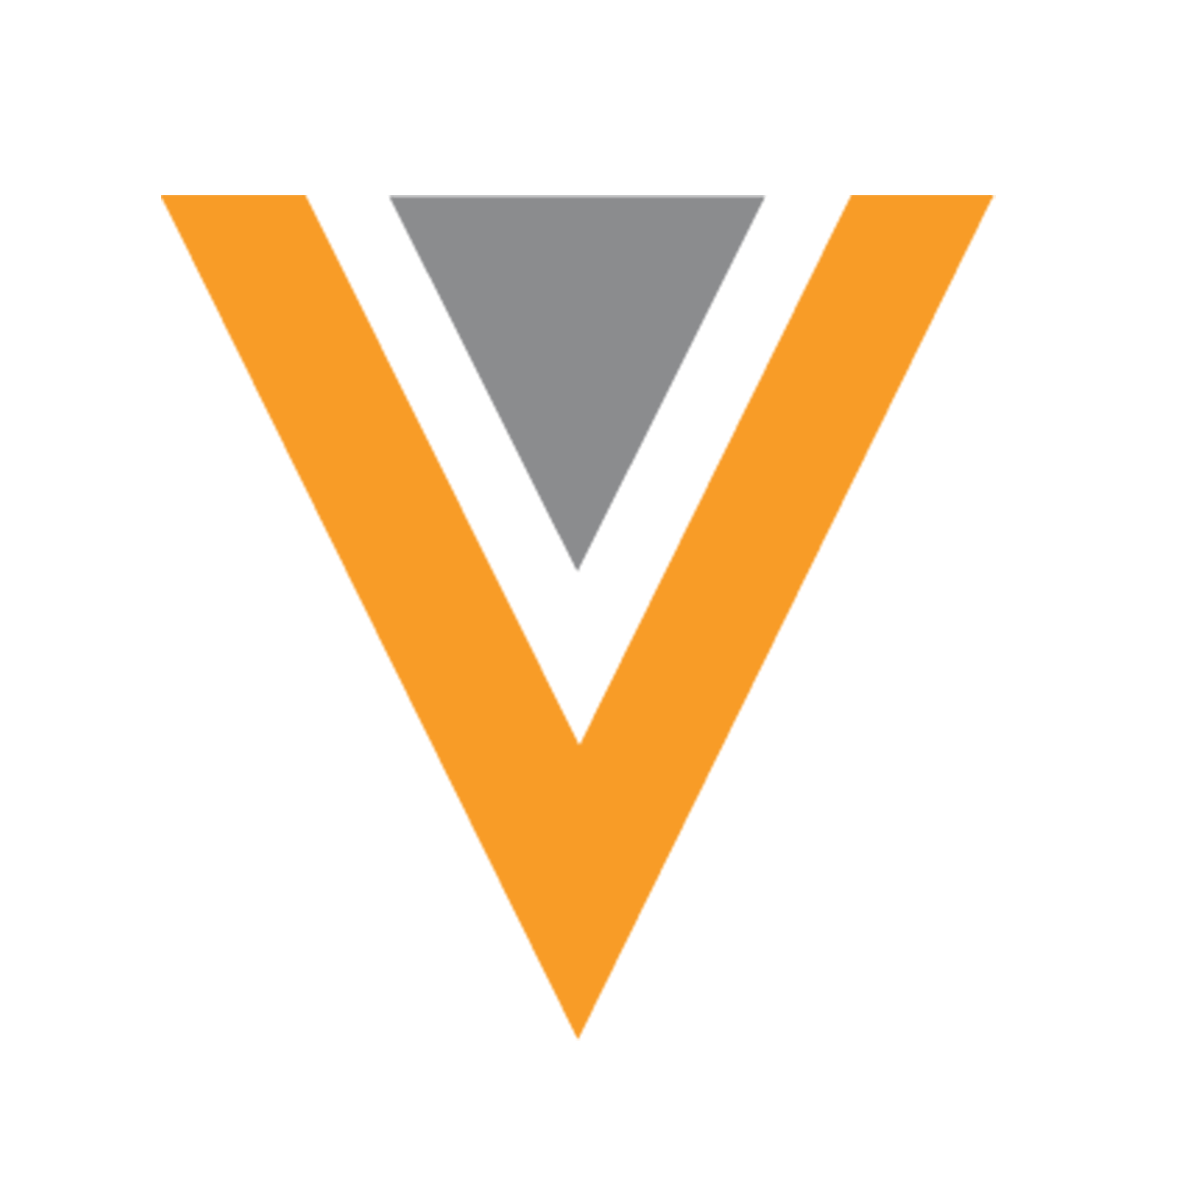 Logo Veeva Systems Spain Sl